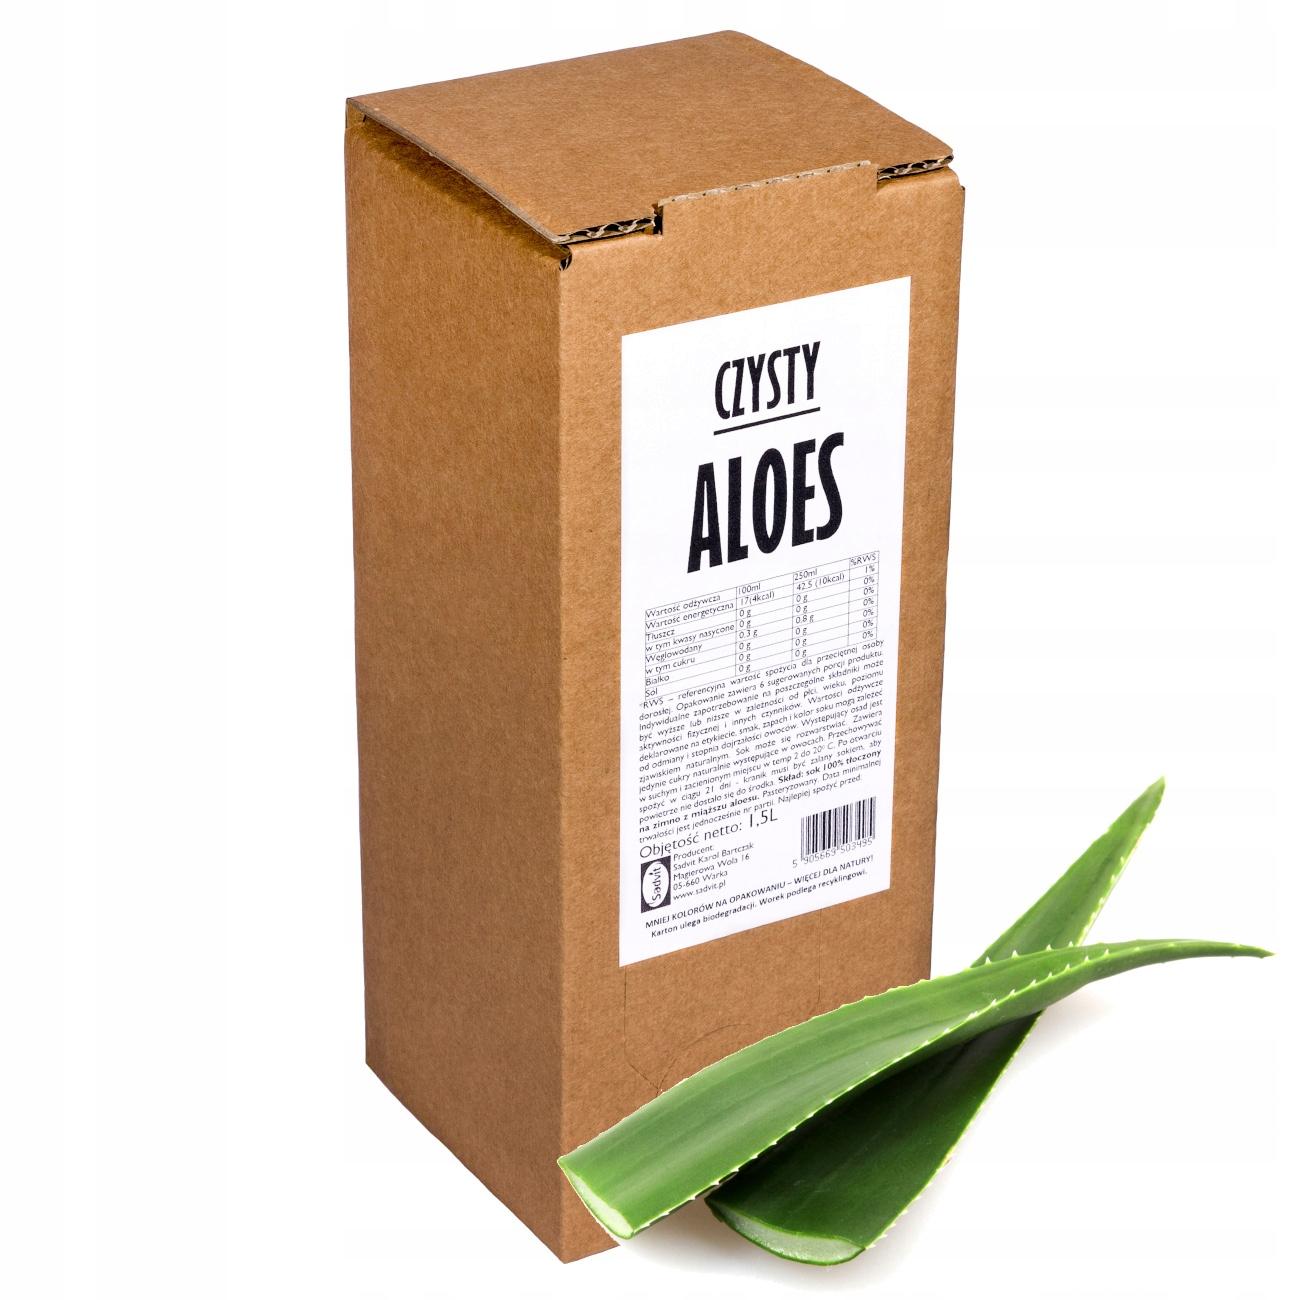 sok aloes 100% sok z aloesu aloesowy 1,5L